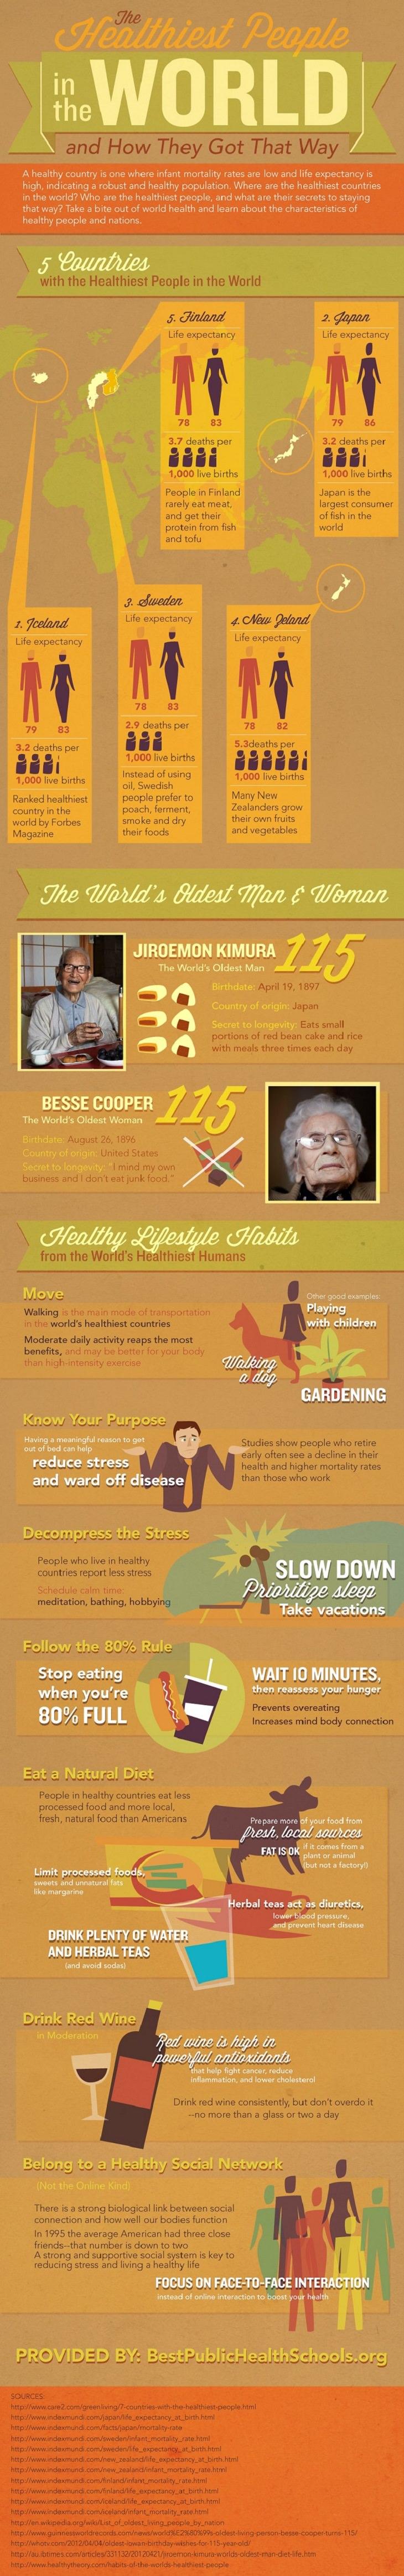 Secrets - Old Age